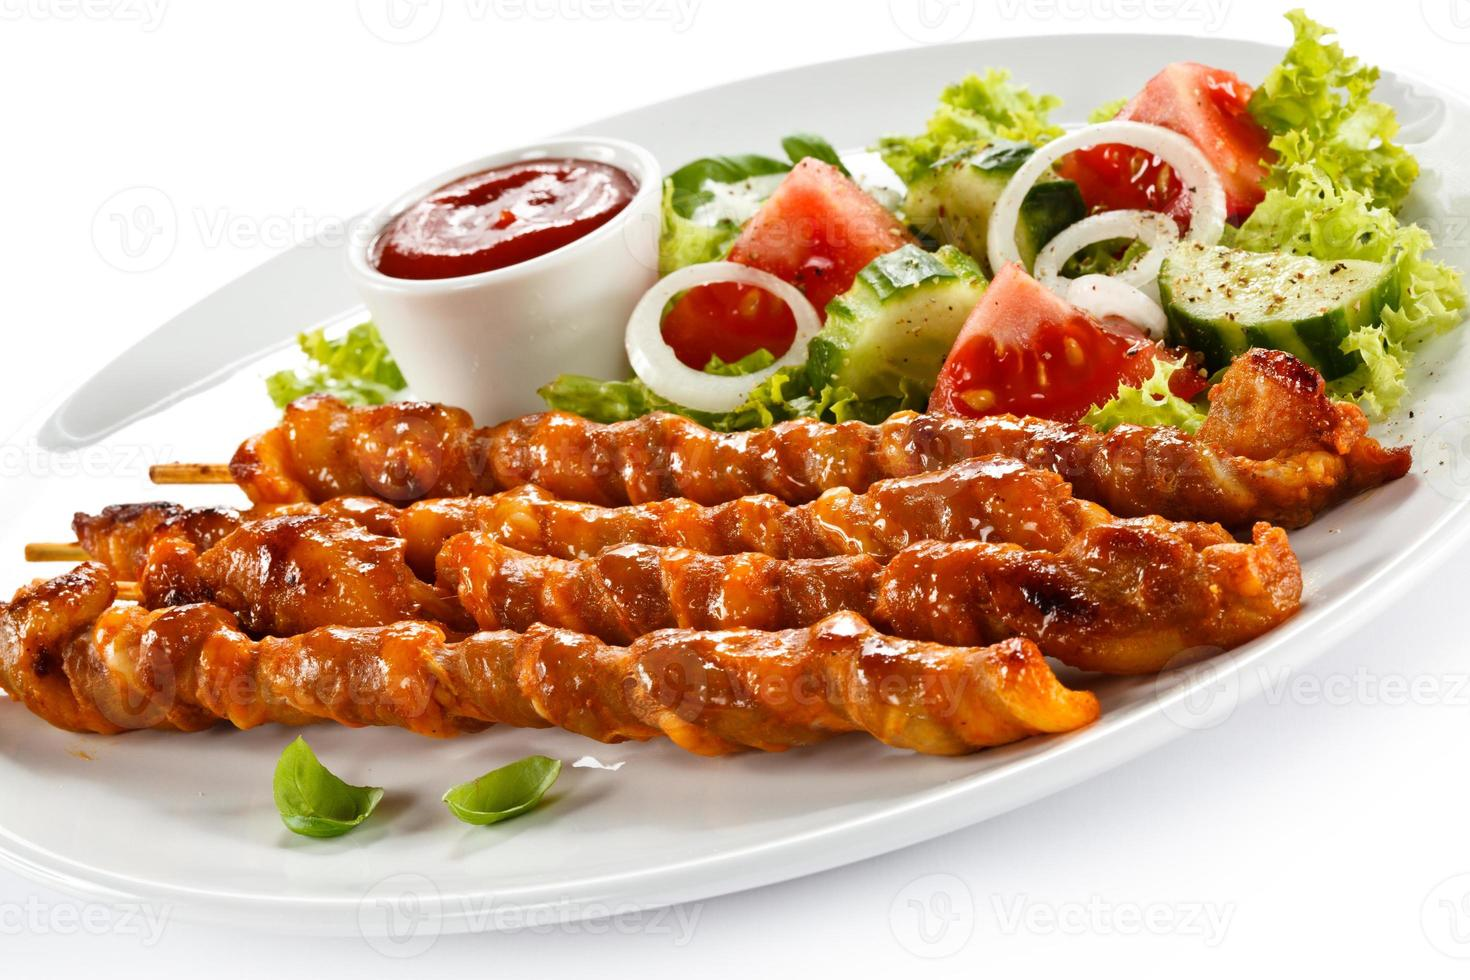 kebab - viande grillée et légumes photo